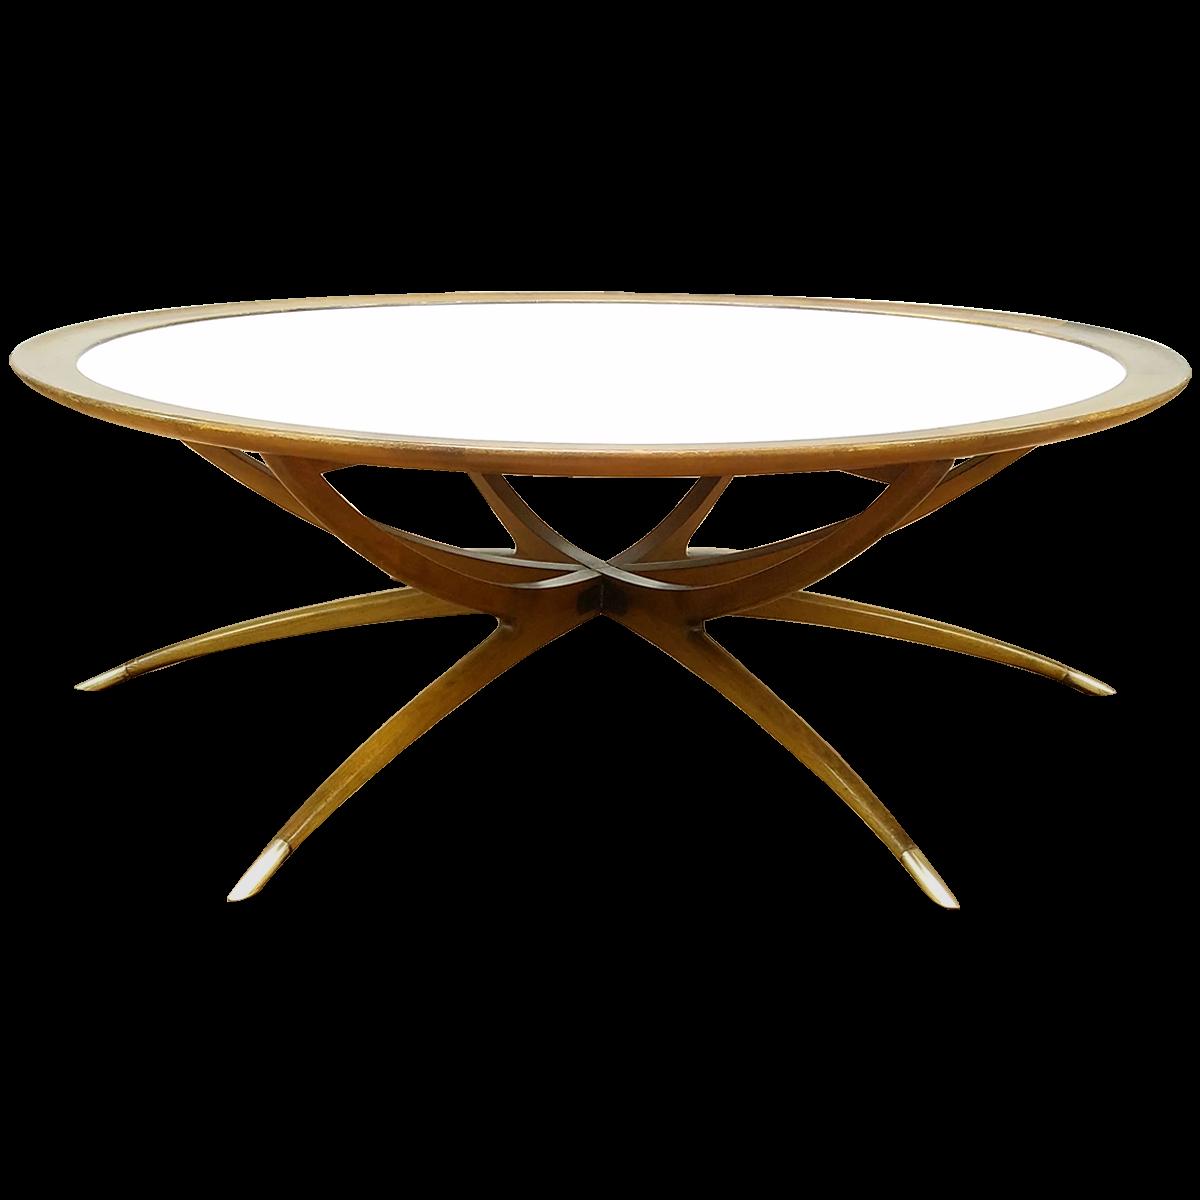 Vintage Danish Modern Teak Spider Leg Coffee Table Vintage Danish Modern Mid Mod Furniture Mid Century Coffee Table [ 1200 x 1200 Pixel ]